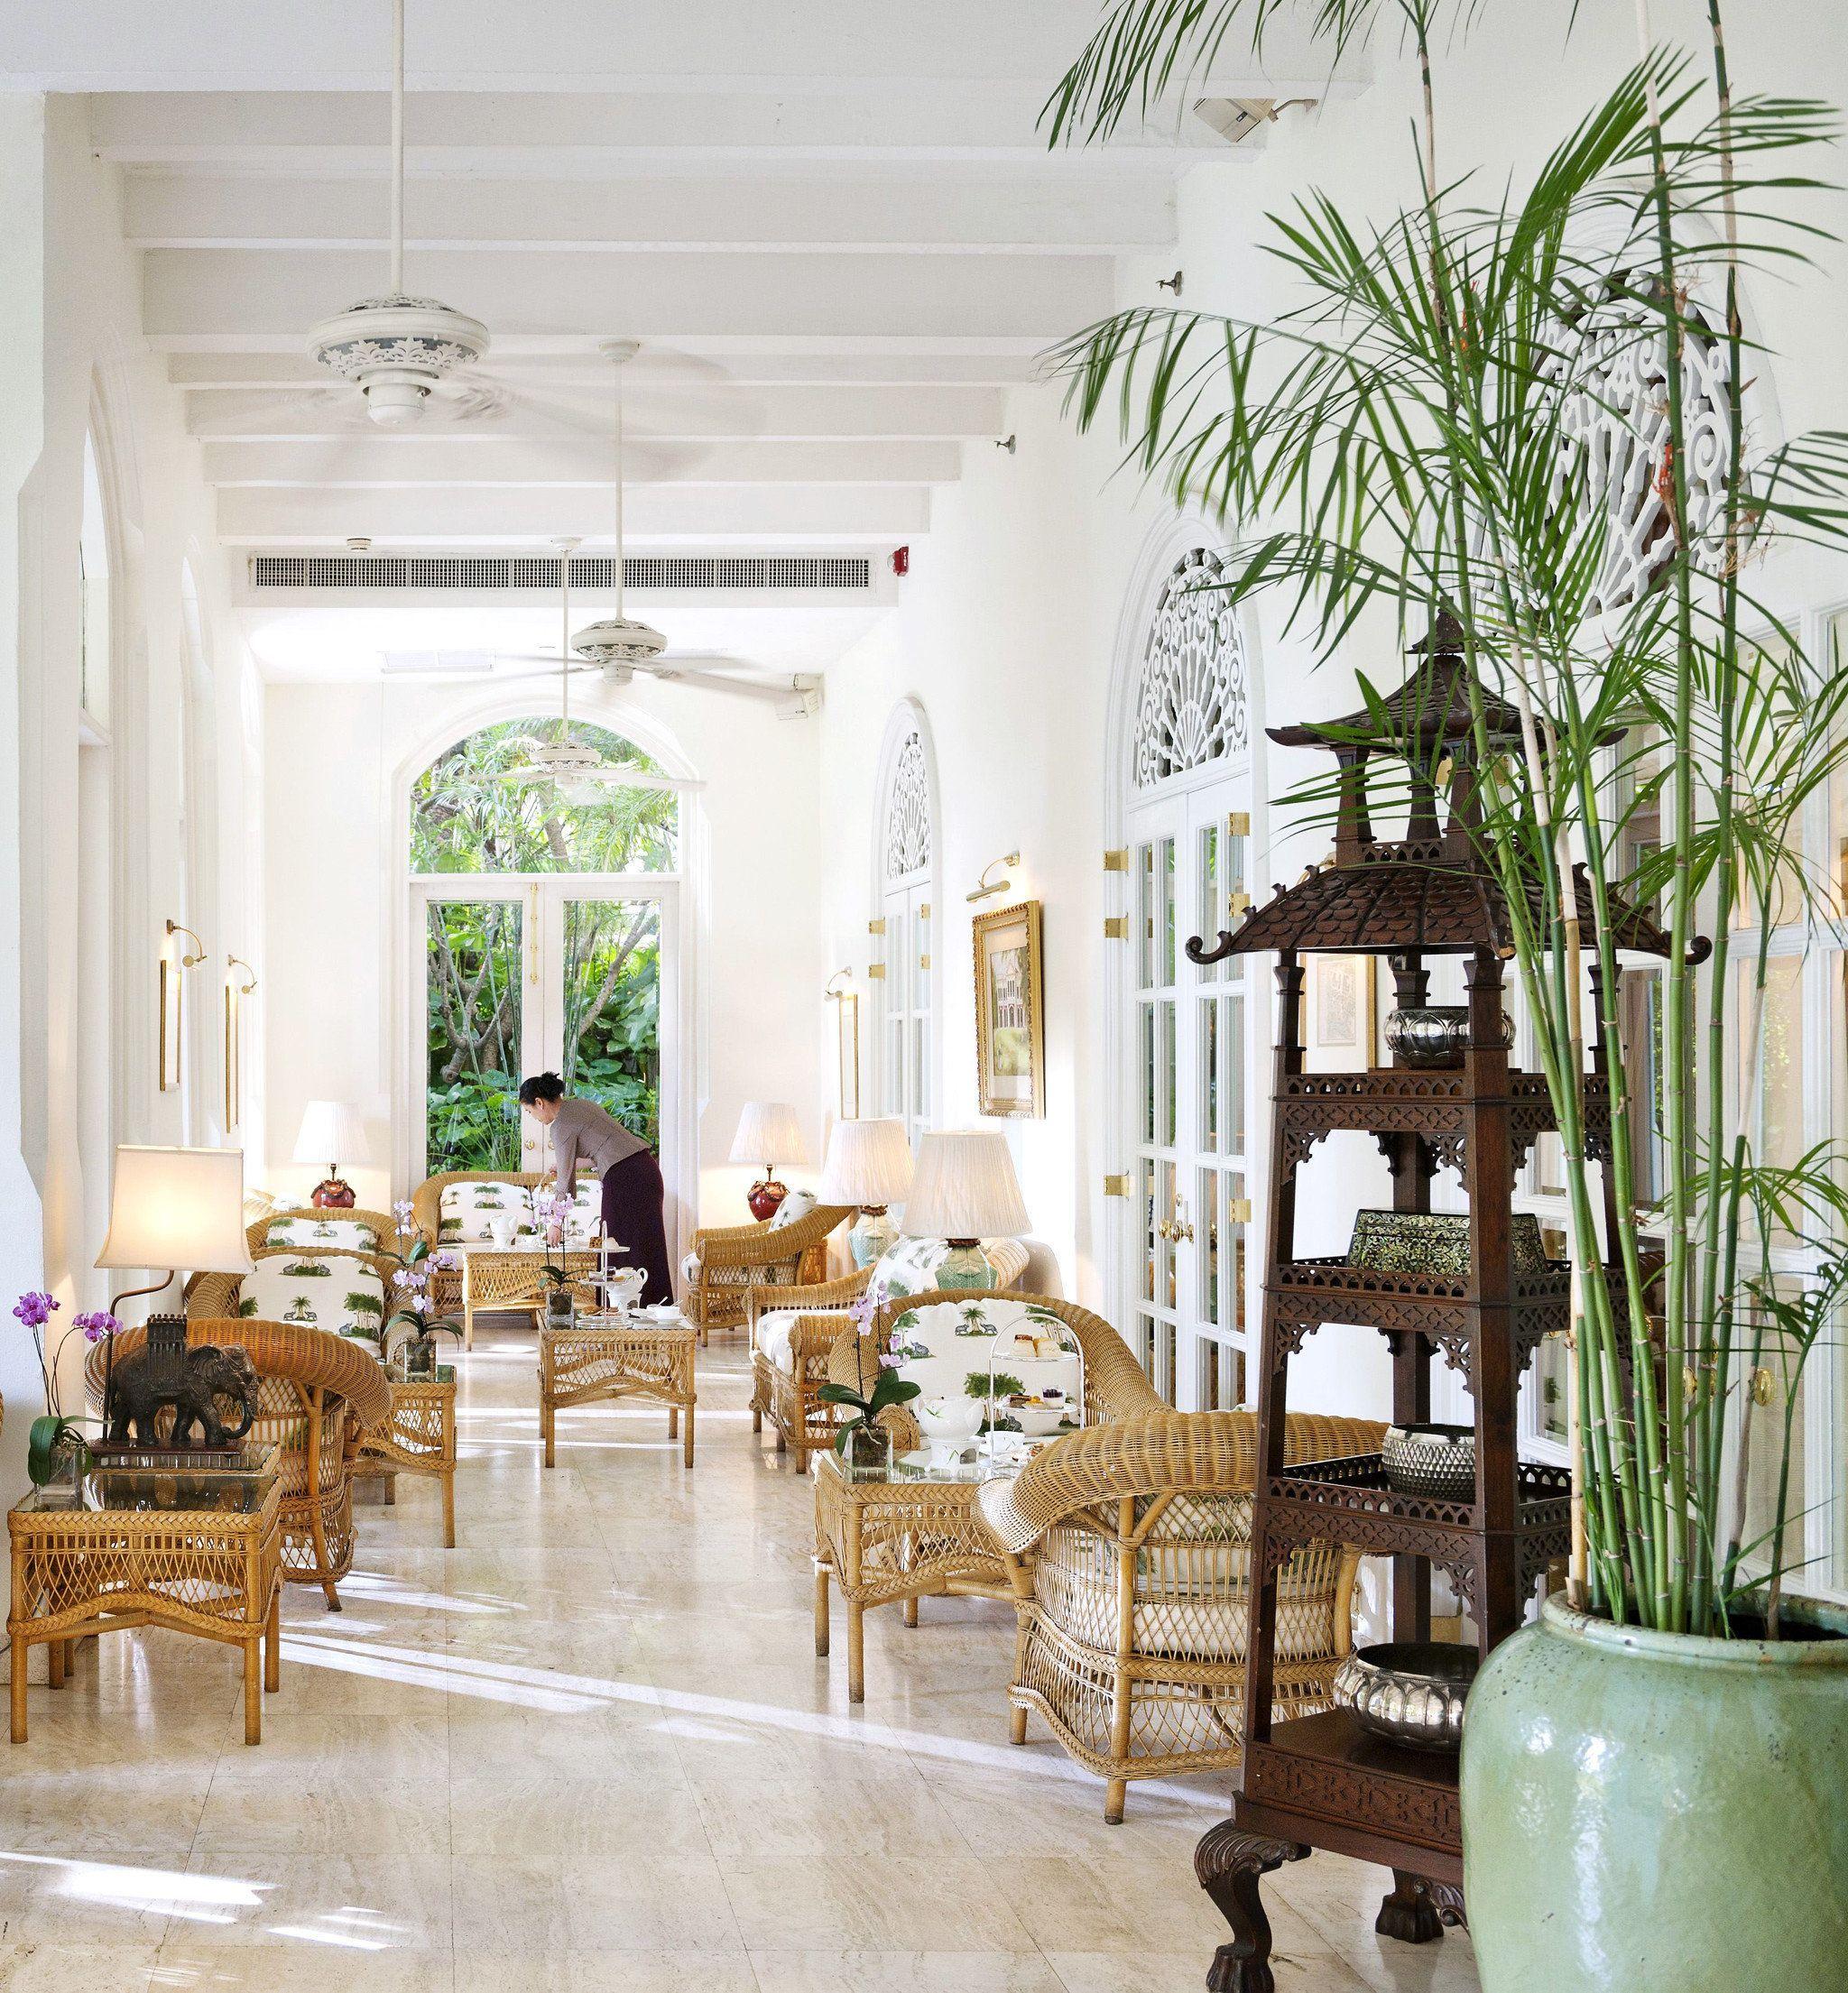 City Cultural Drink Eat Elegant Hotels Lounge Terrace Waterfront Indoor